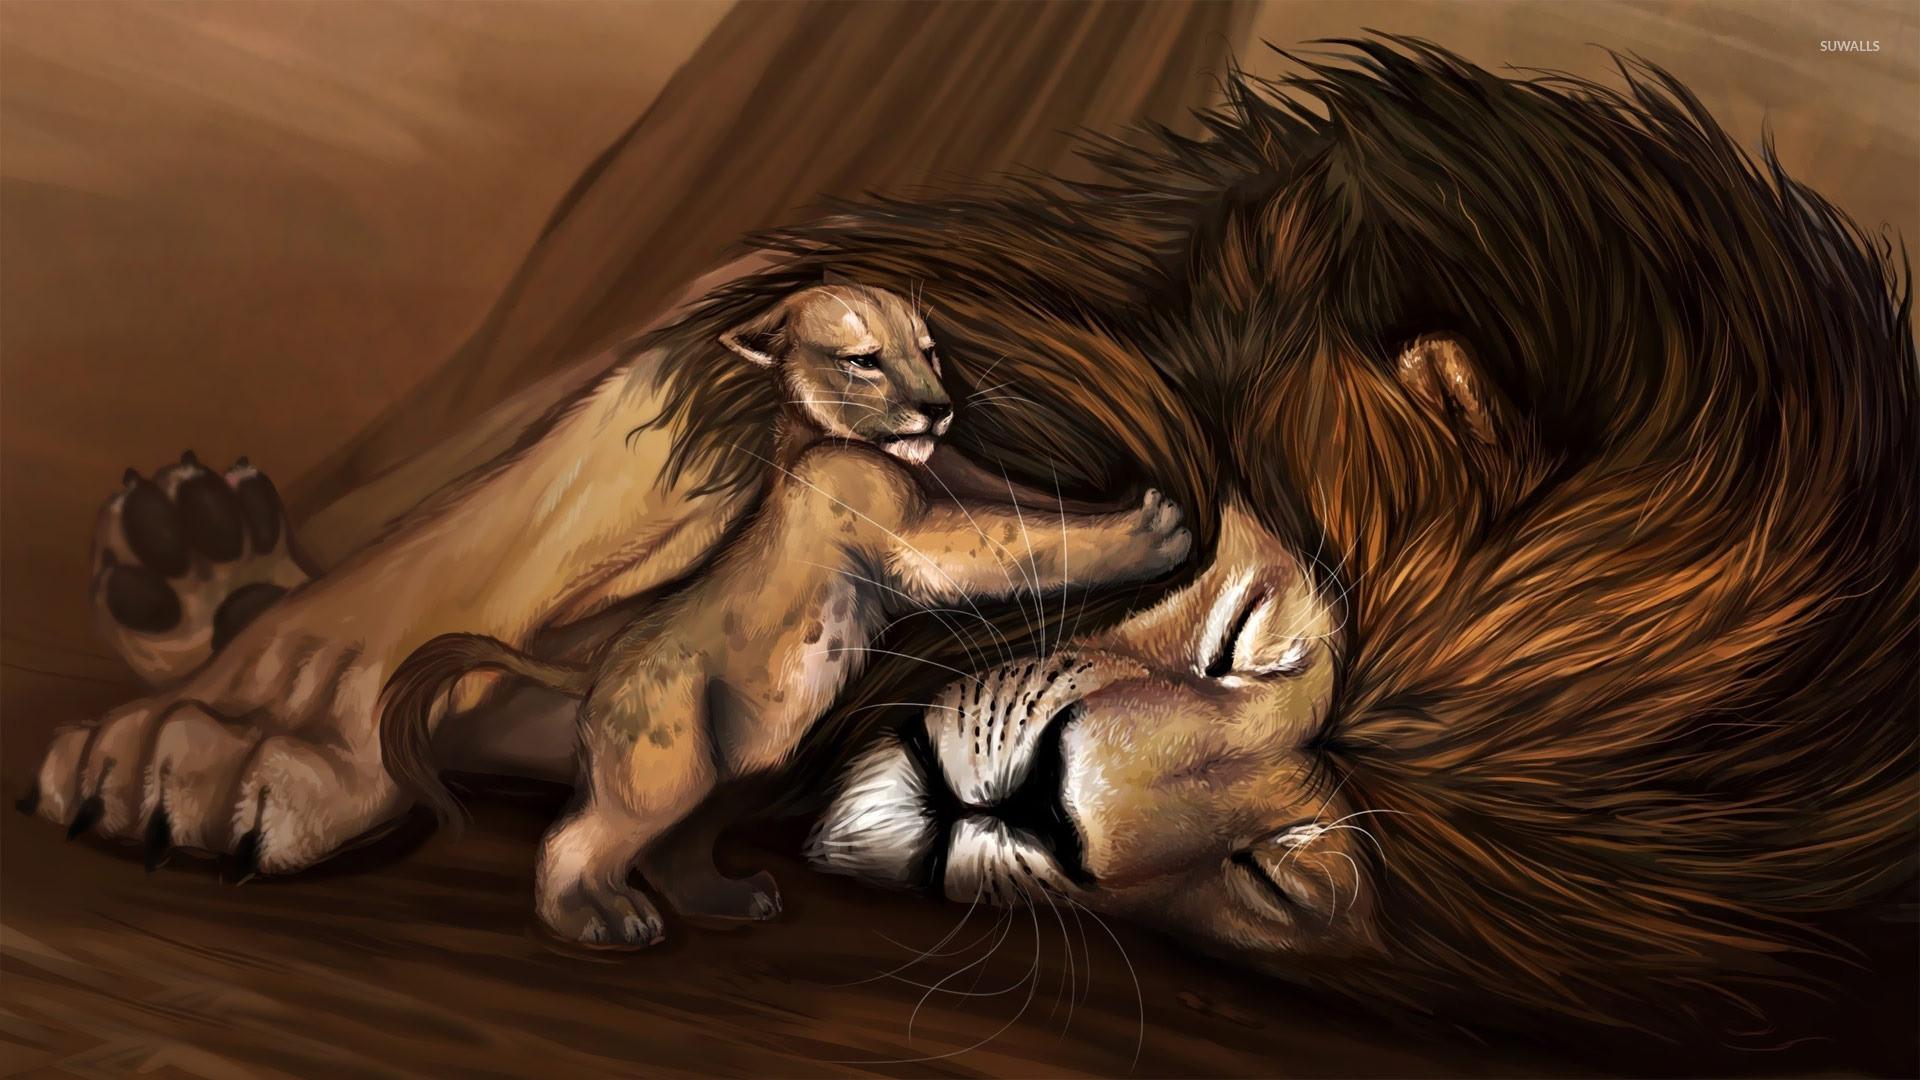 Cub waking up lion wallpaper jpg